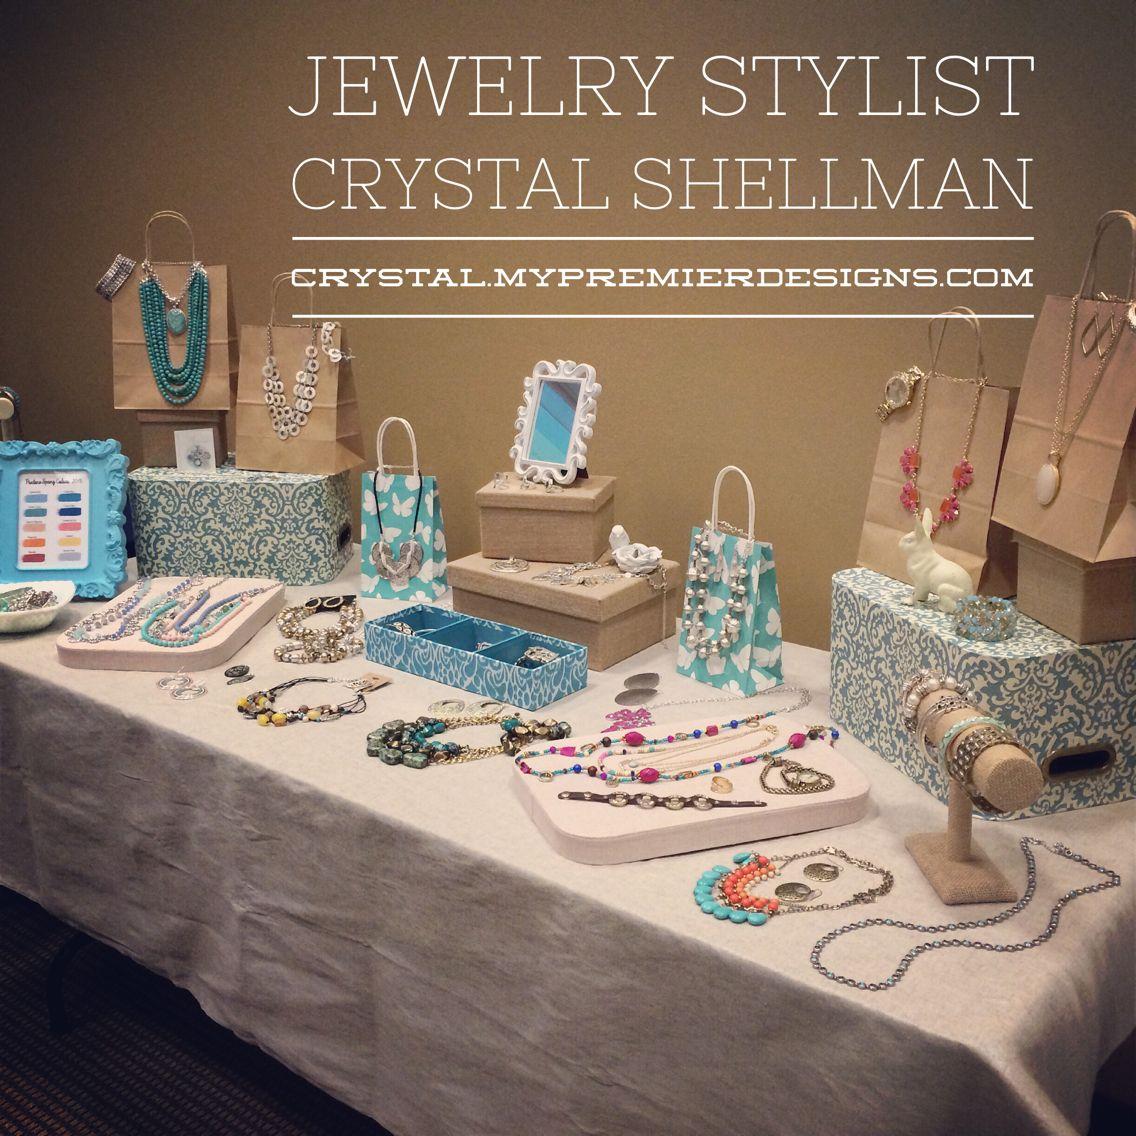 Jewelry Table Display Premier Designs Jewelry Crystal Mypremierdesigns Com Pdstyle Pdlife Jewelry Table Display Premier Designs Diy Jewelry Display